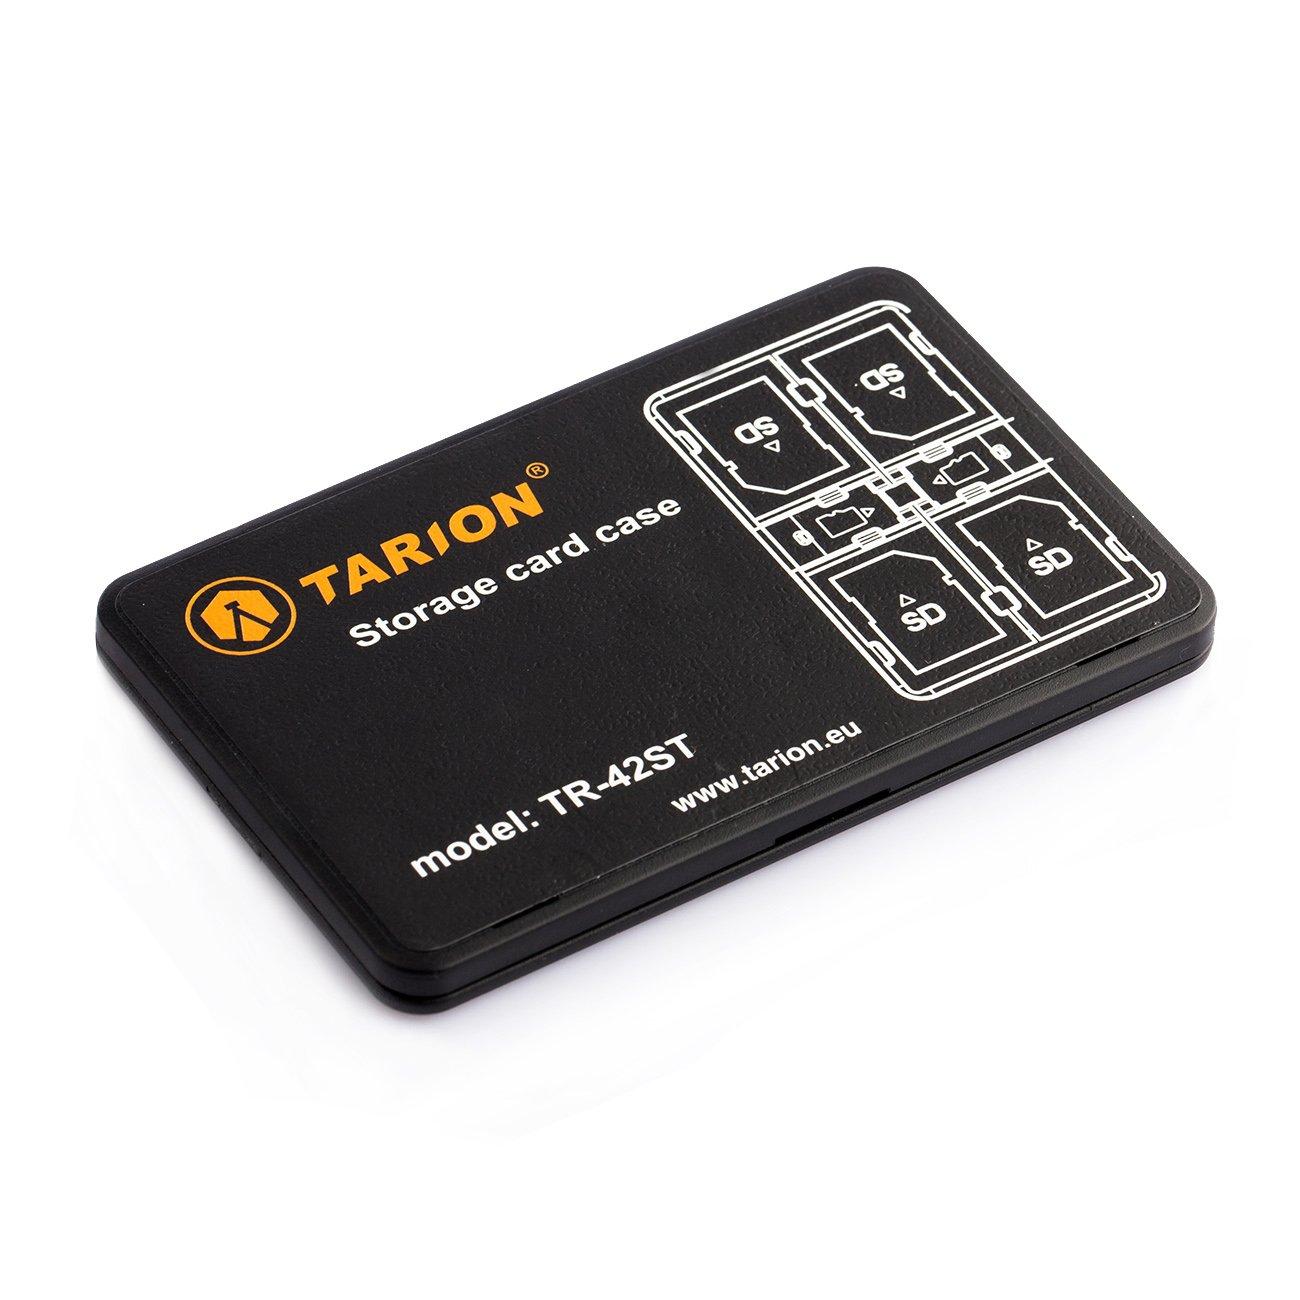 TARION Memory Card Case Storage Card Box Holder Fits for SD Card/TF Card/SIM Card/Nano Card TARION-Cardcase